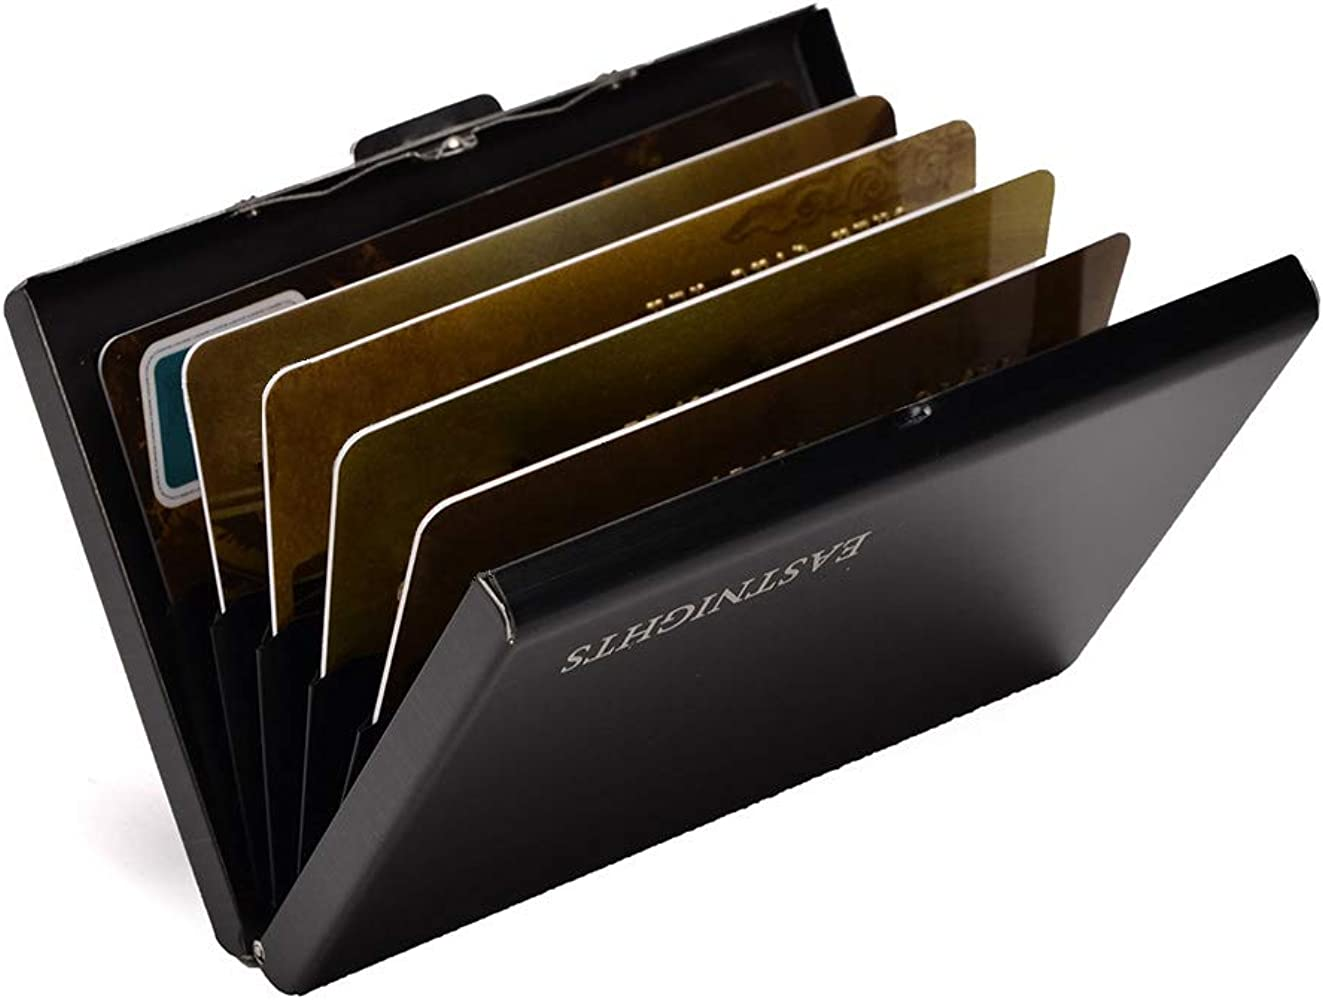 RFID Debit Credit Card Protecting Security Wallet Holder Hard Case